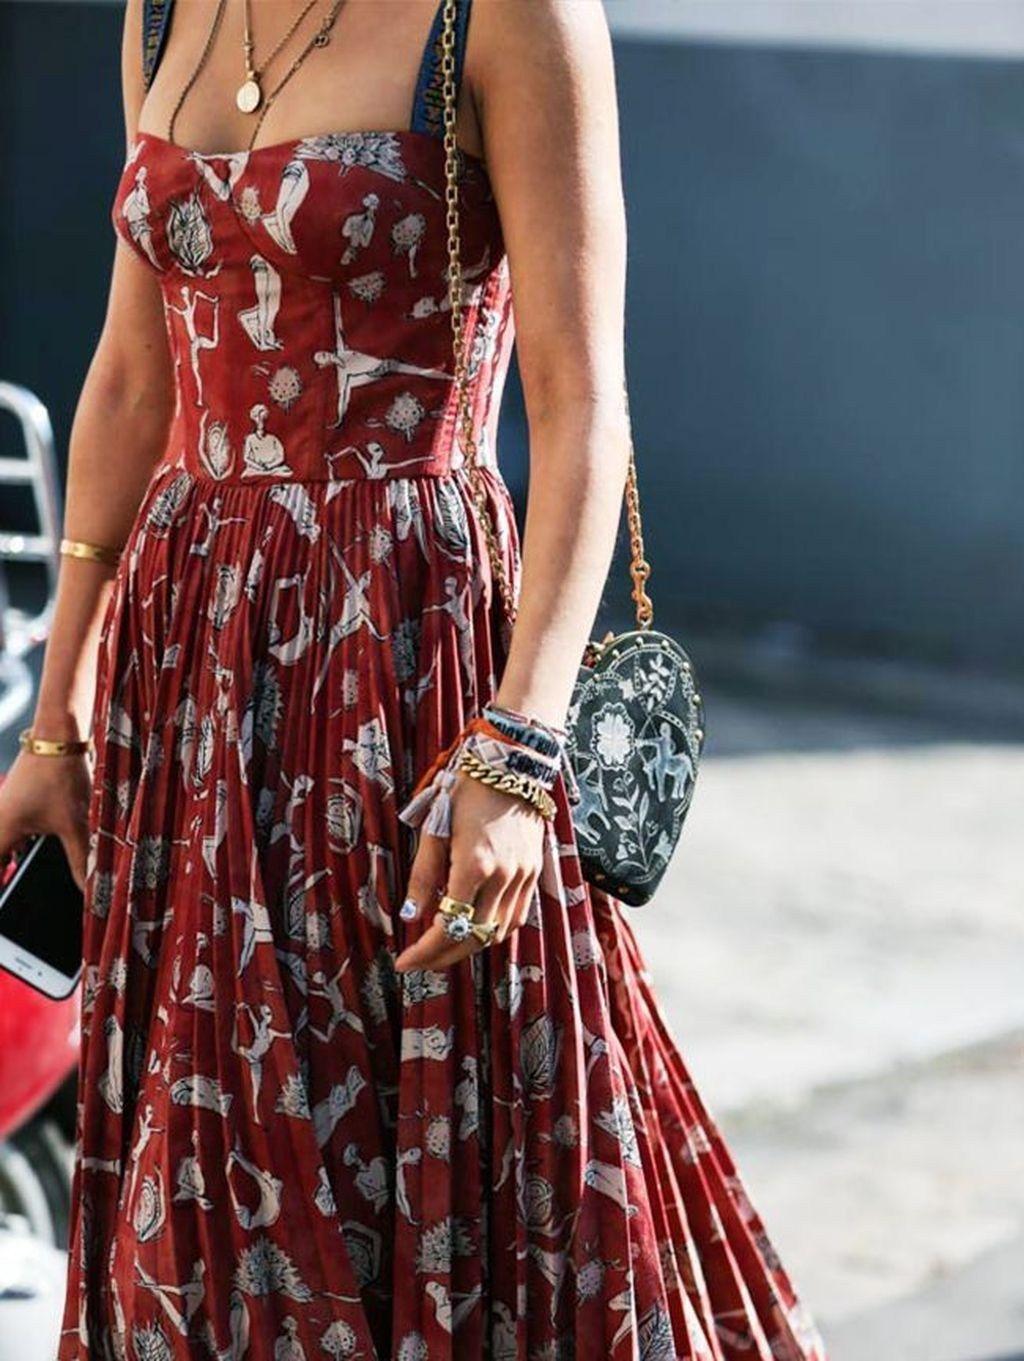 Gorgeous Boho Chic Fashion 2018 Trends Ideas 02 | Cosas ...